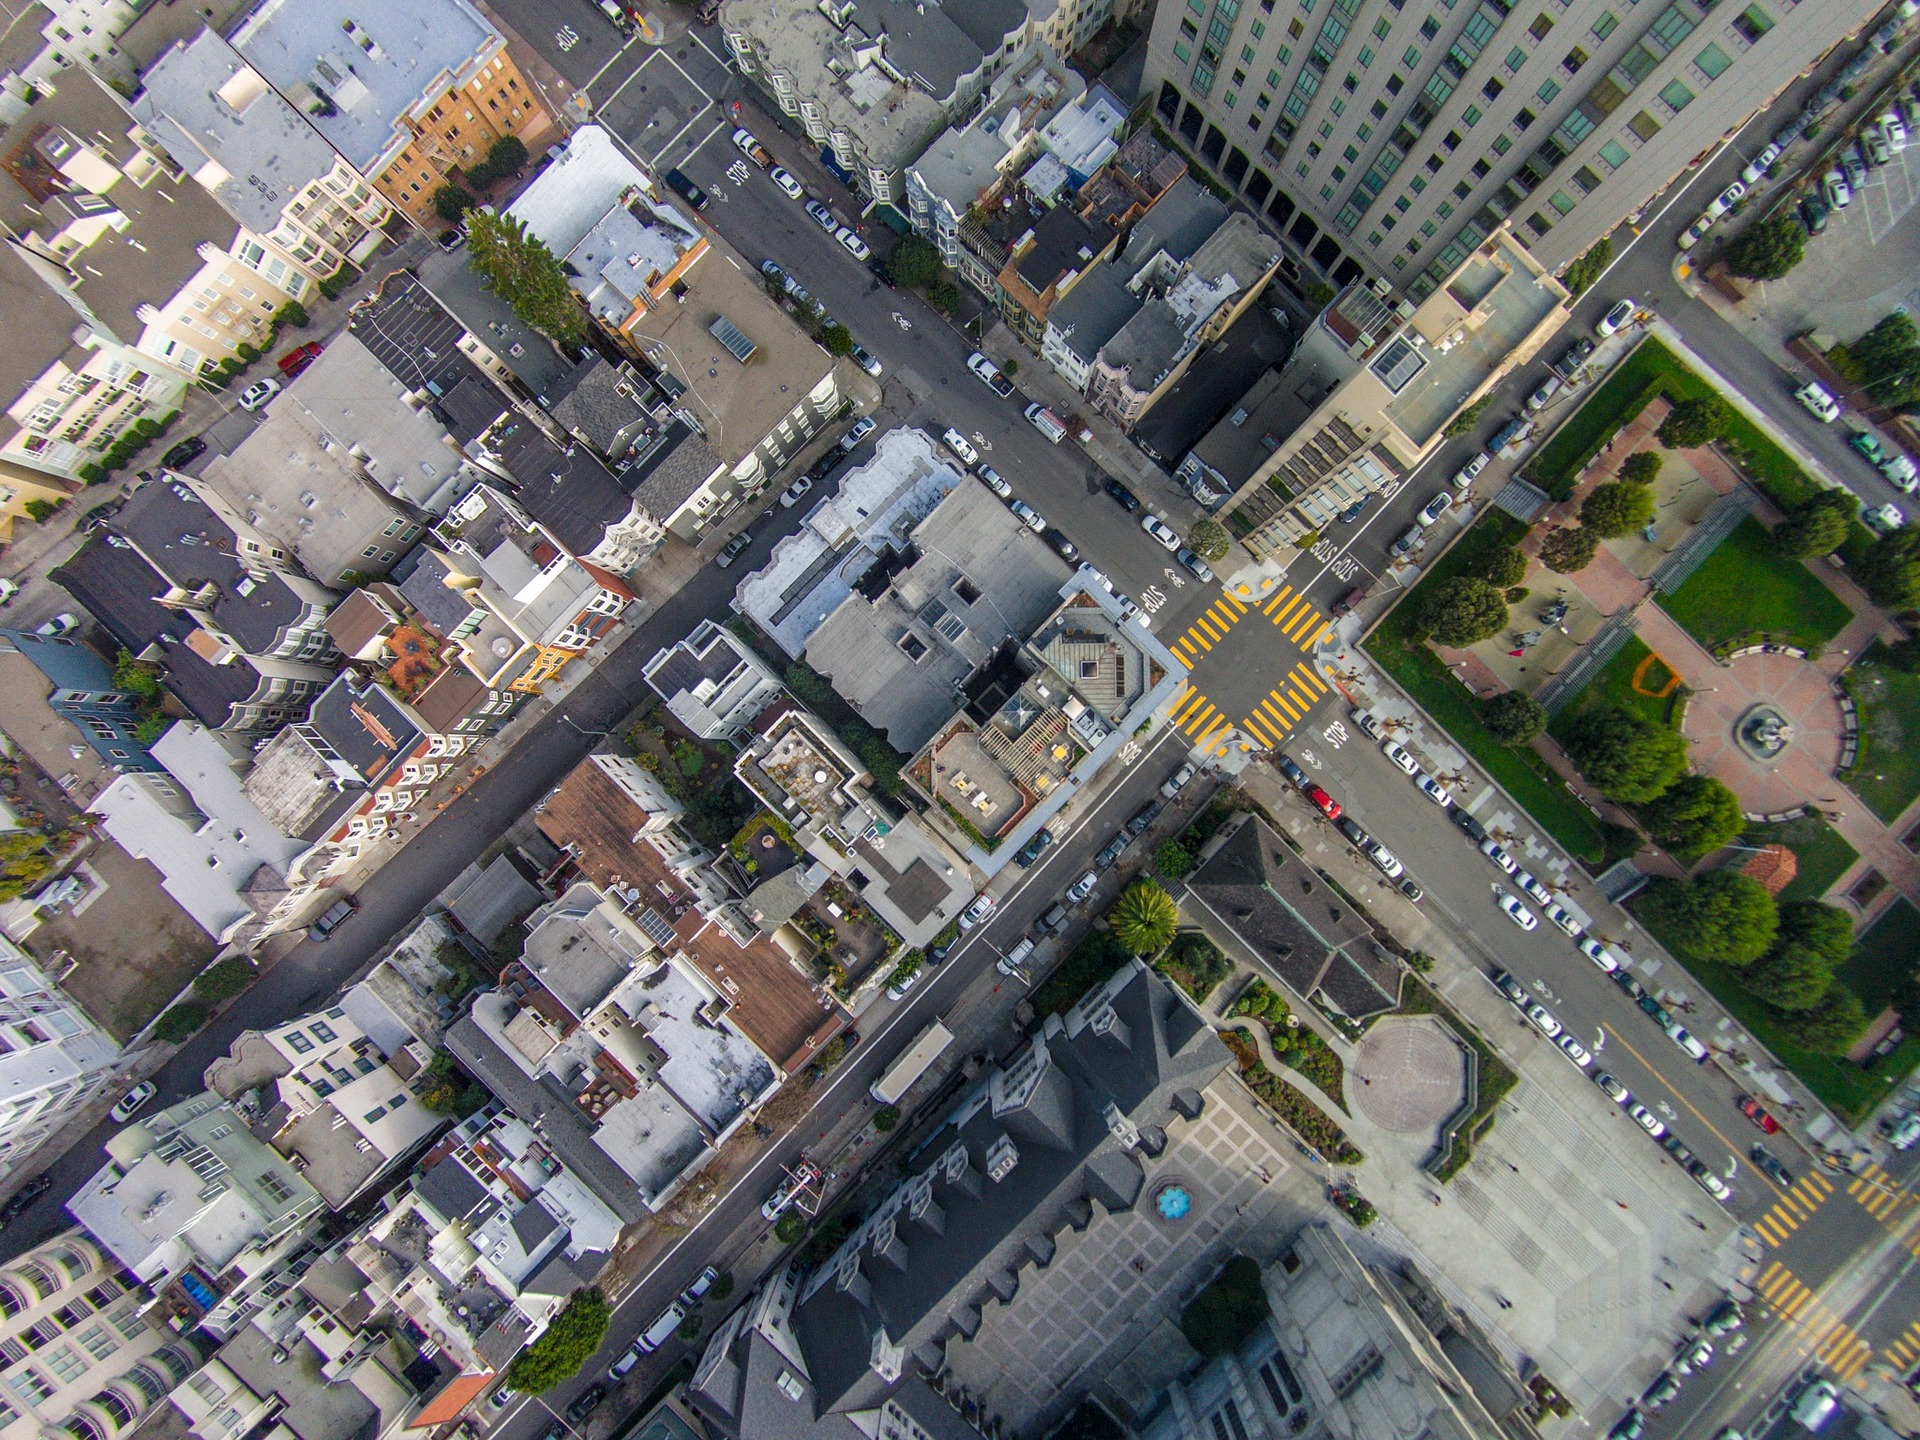 Imageof city block